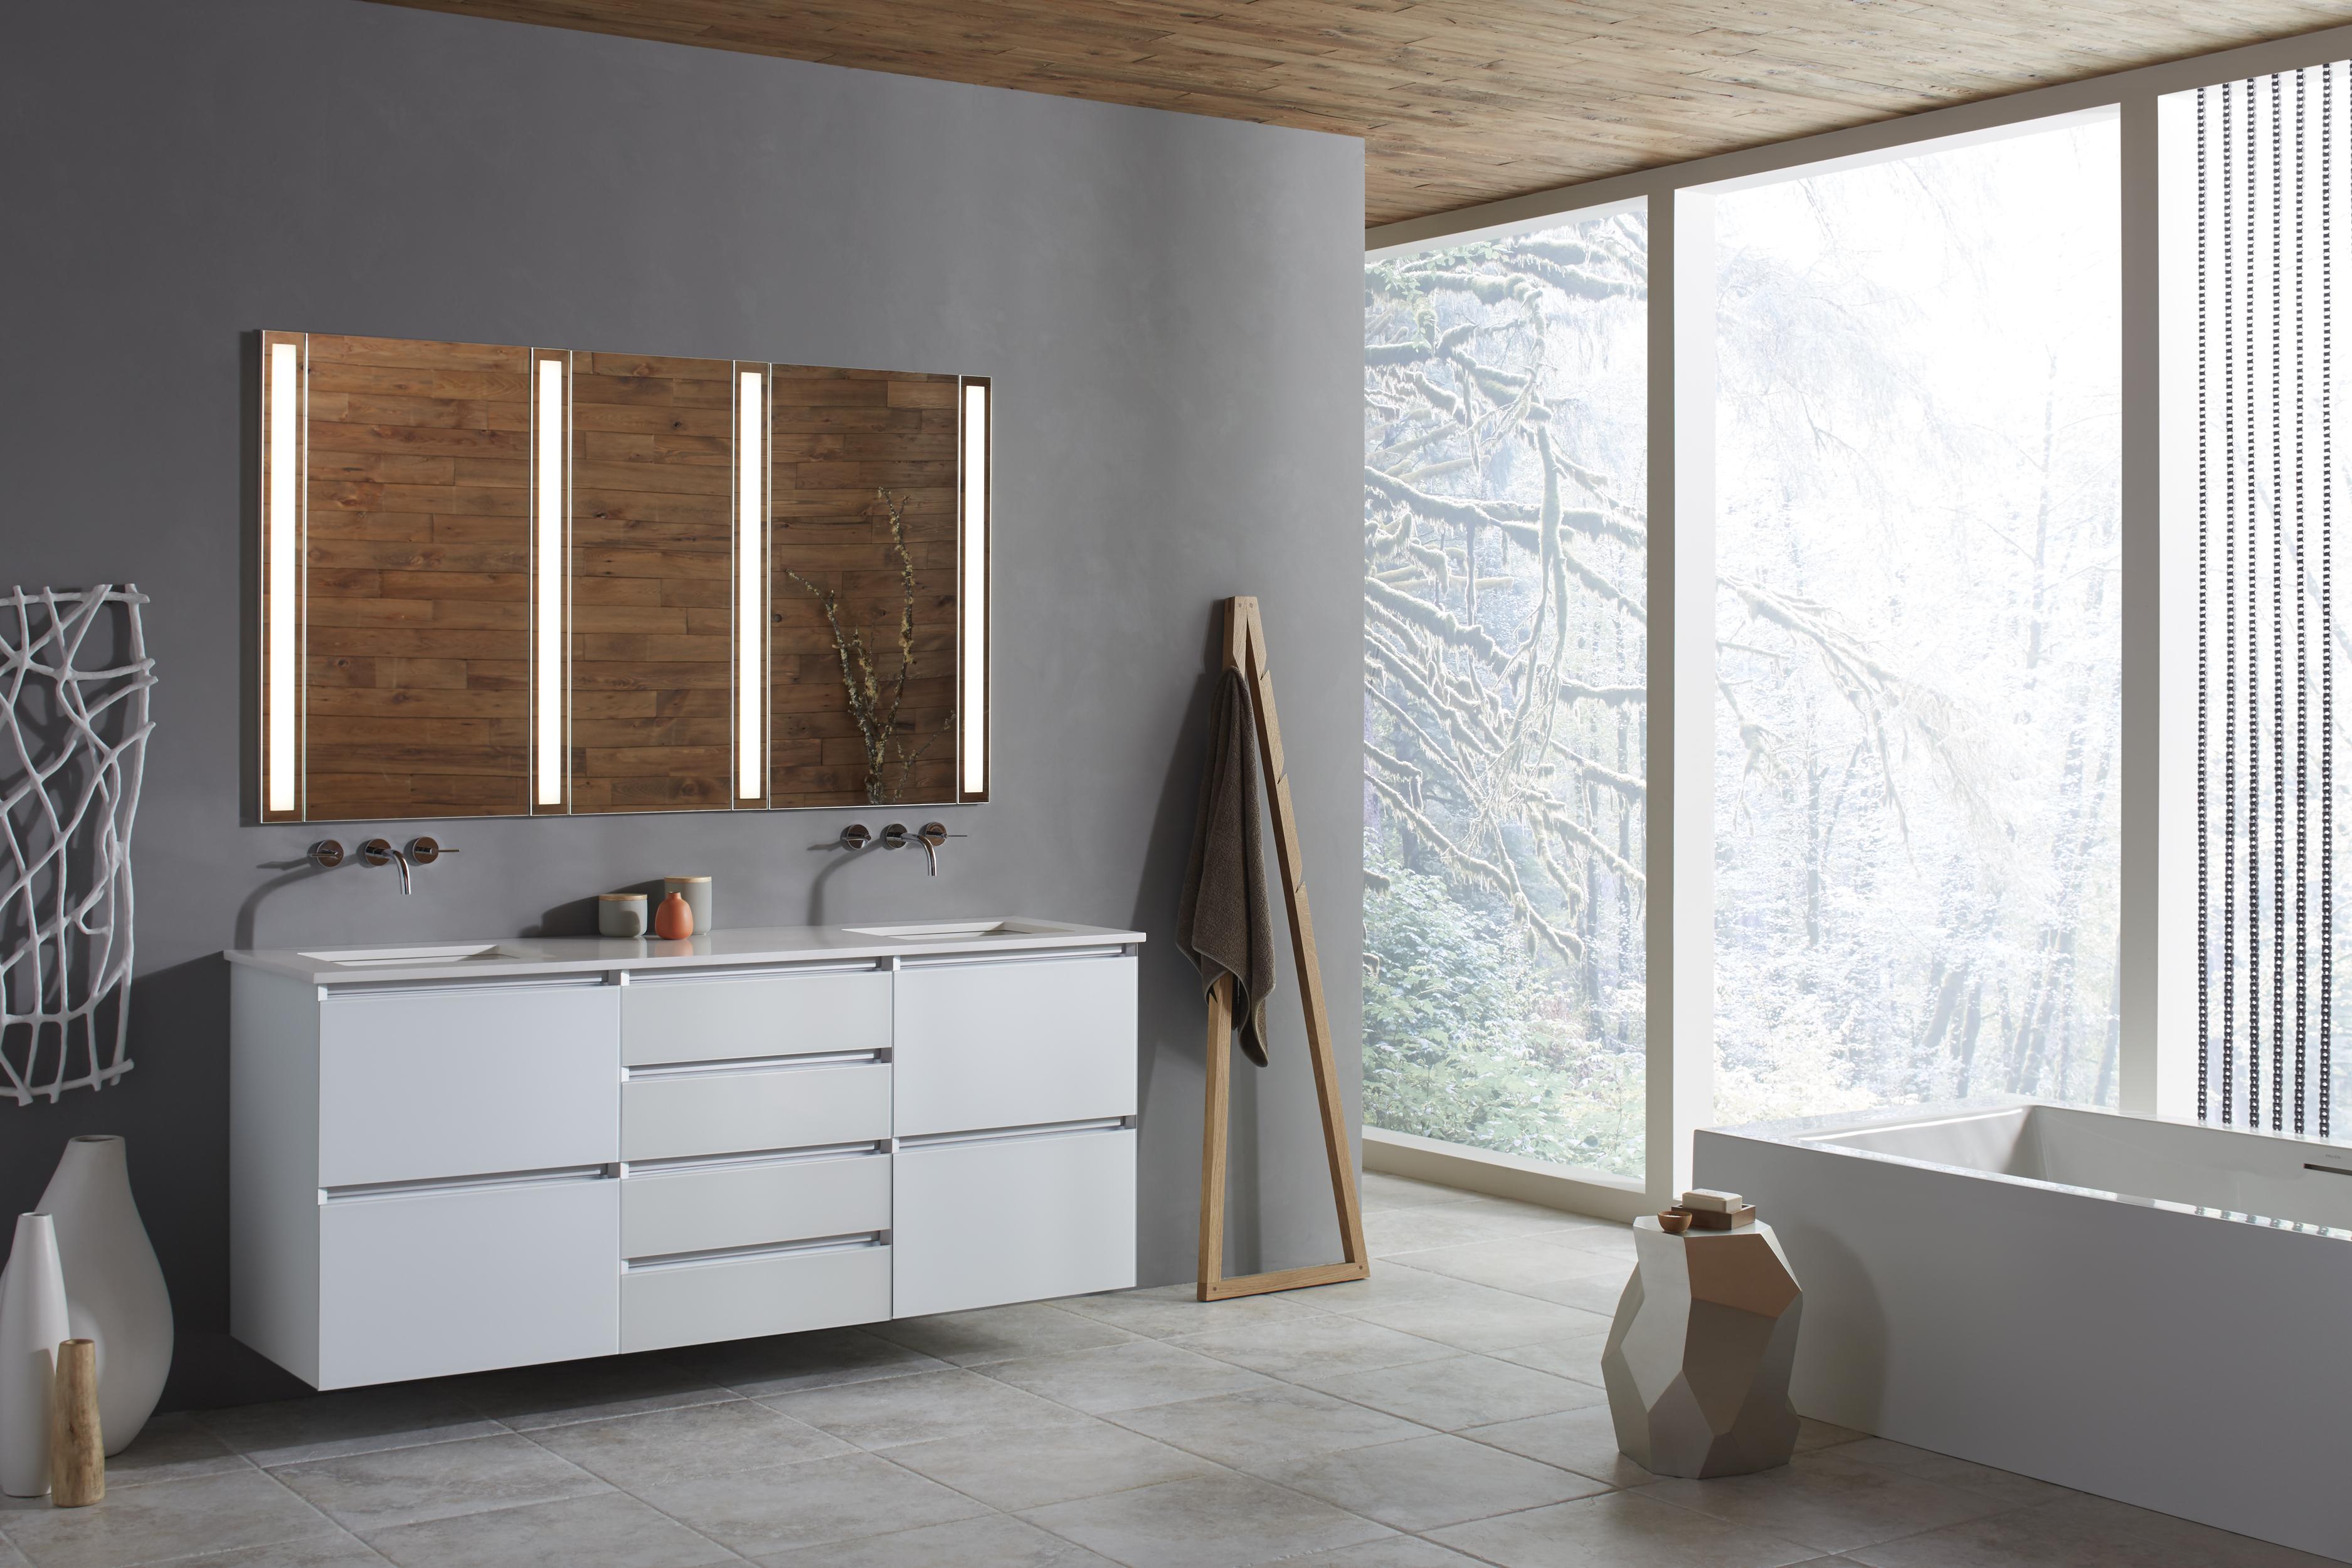 Modern Minimalism & One Wall Sconce | P34421-00 | Lighting | Kallista | Kallista azcodes.com